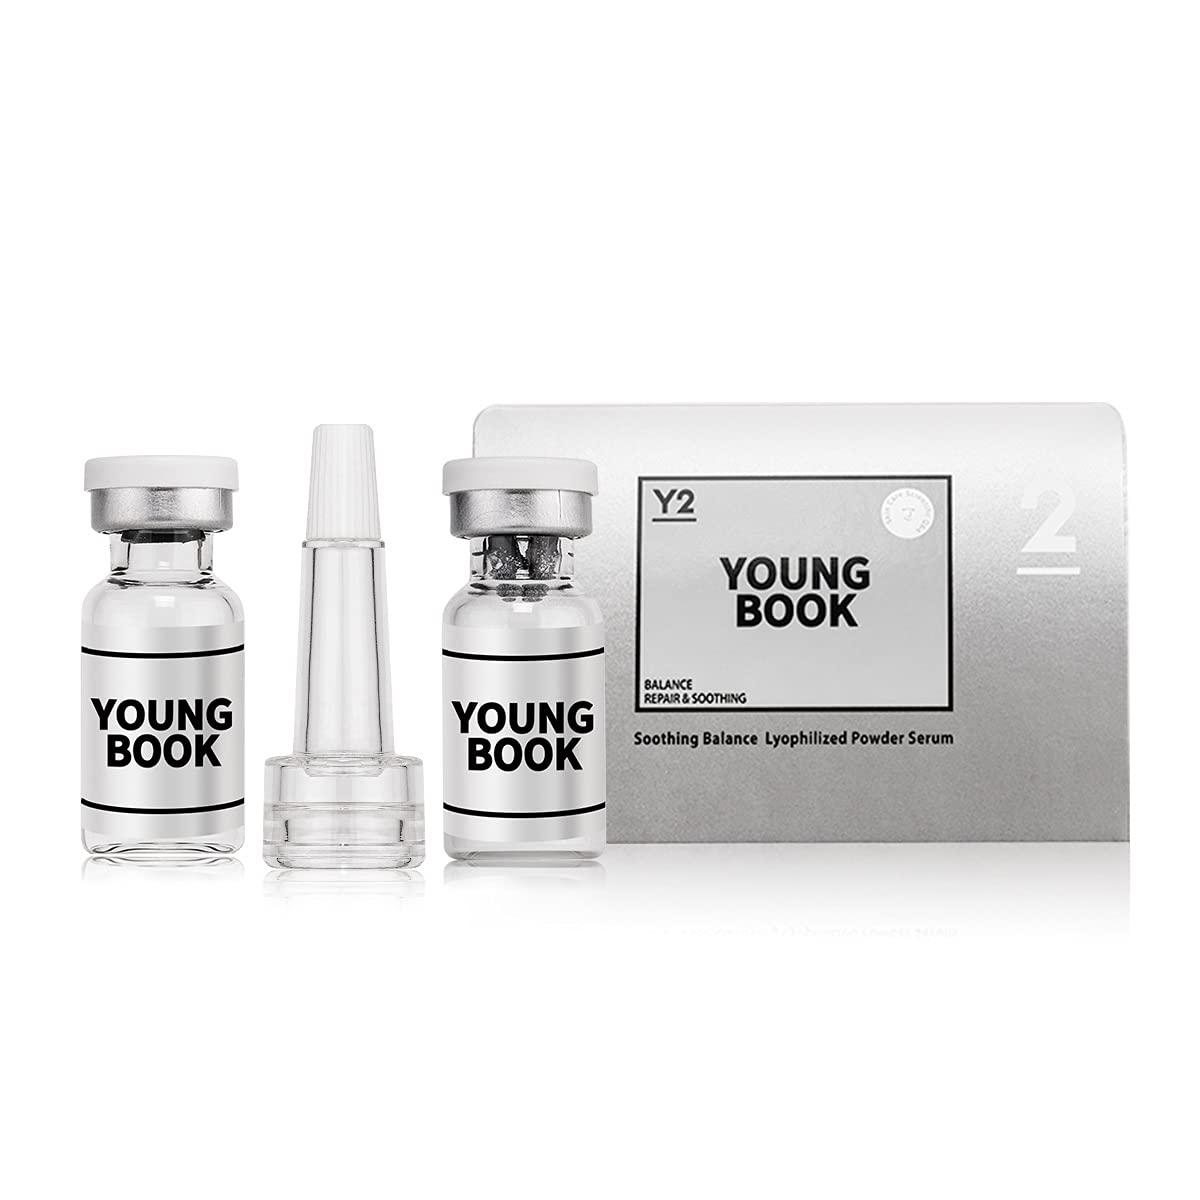 YOUNGBOOK Soothing Balance Lyophilized Powder Repairi Skin List price Austin Mall Serum